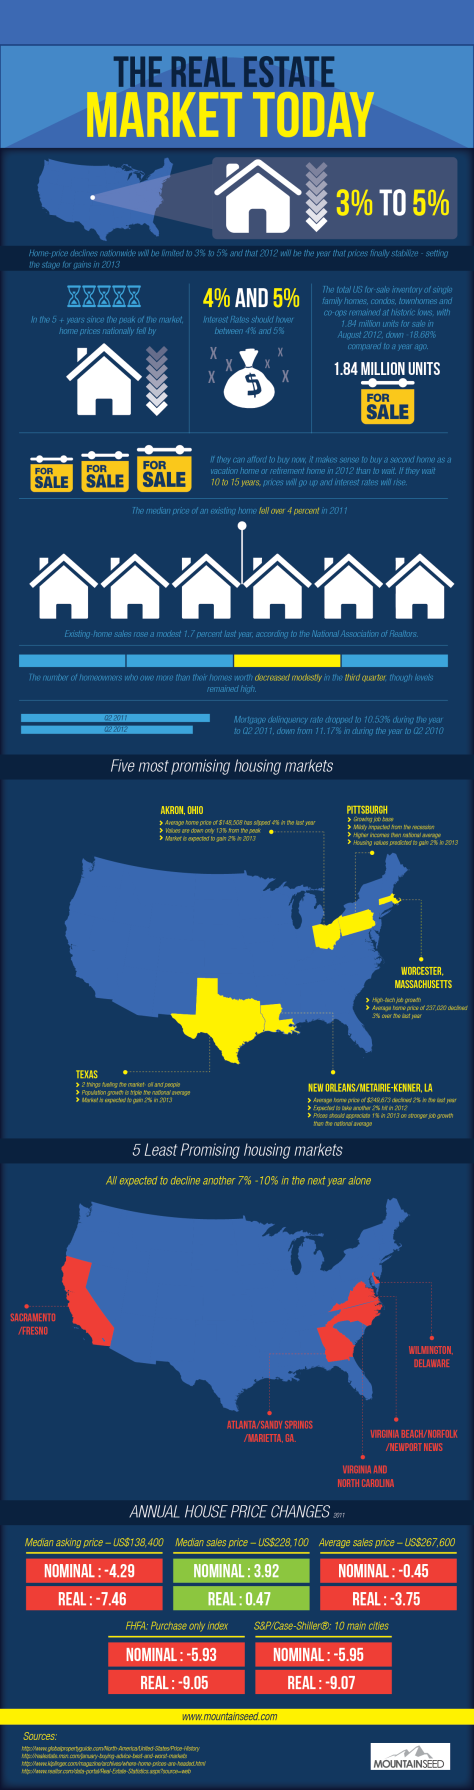 the-real-estate-market-today_50662989e0d03